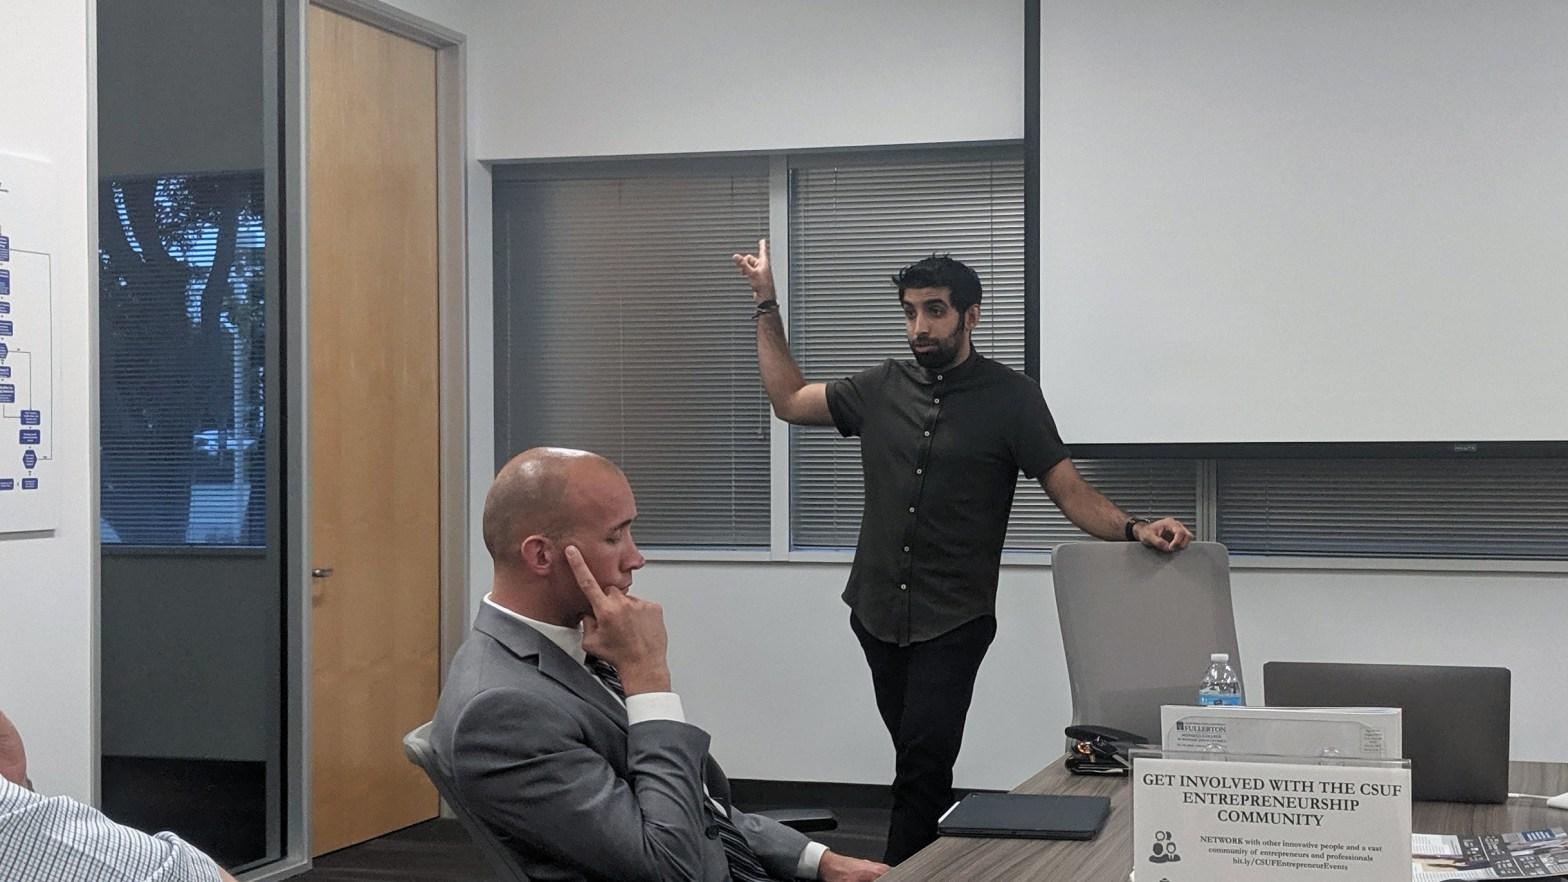 Dalip Jaggi at CSUF Startup Incubator